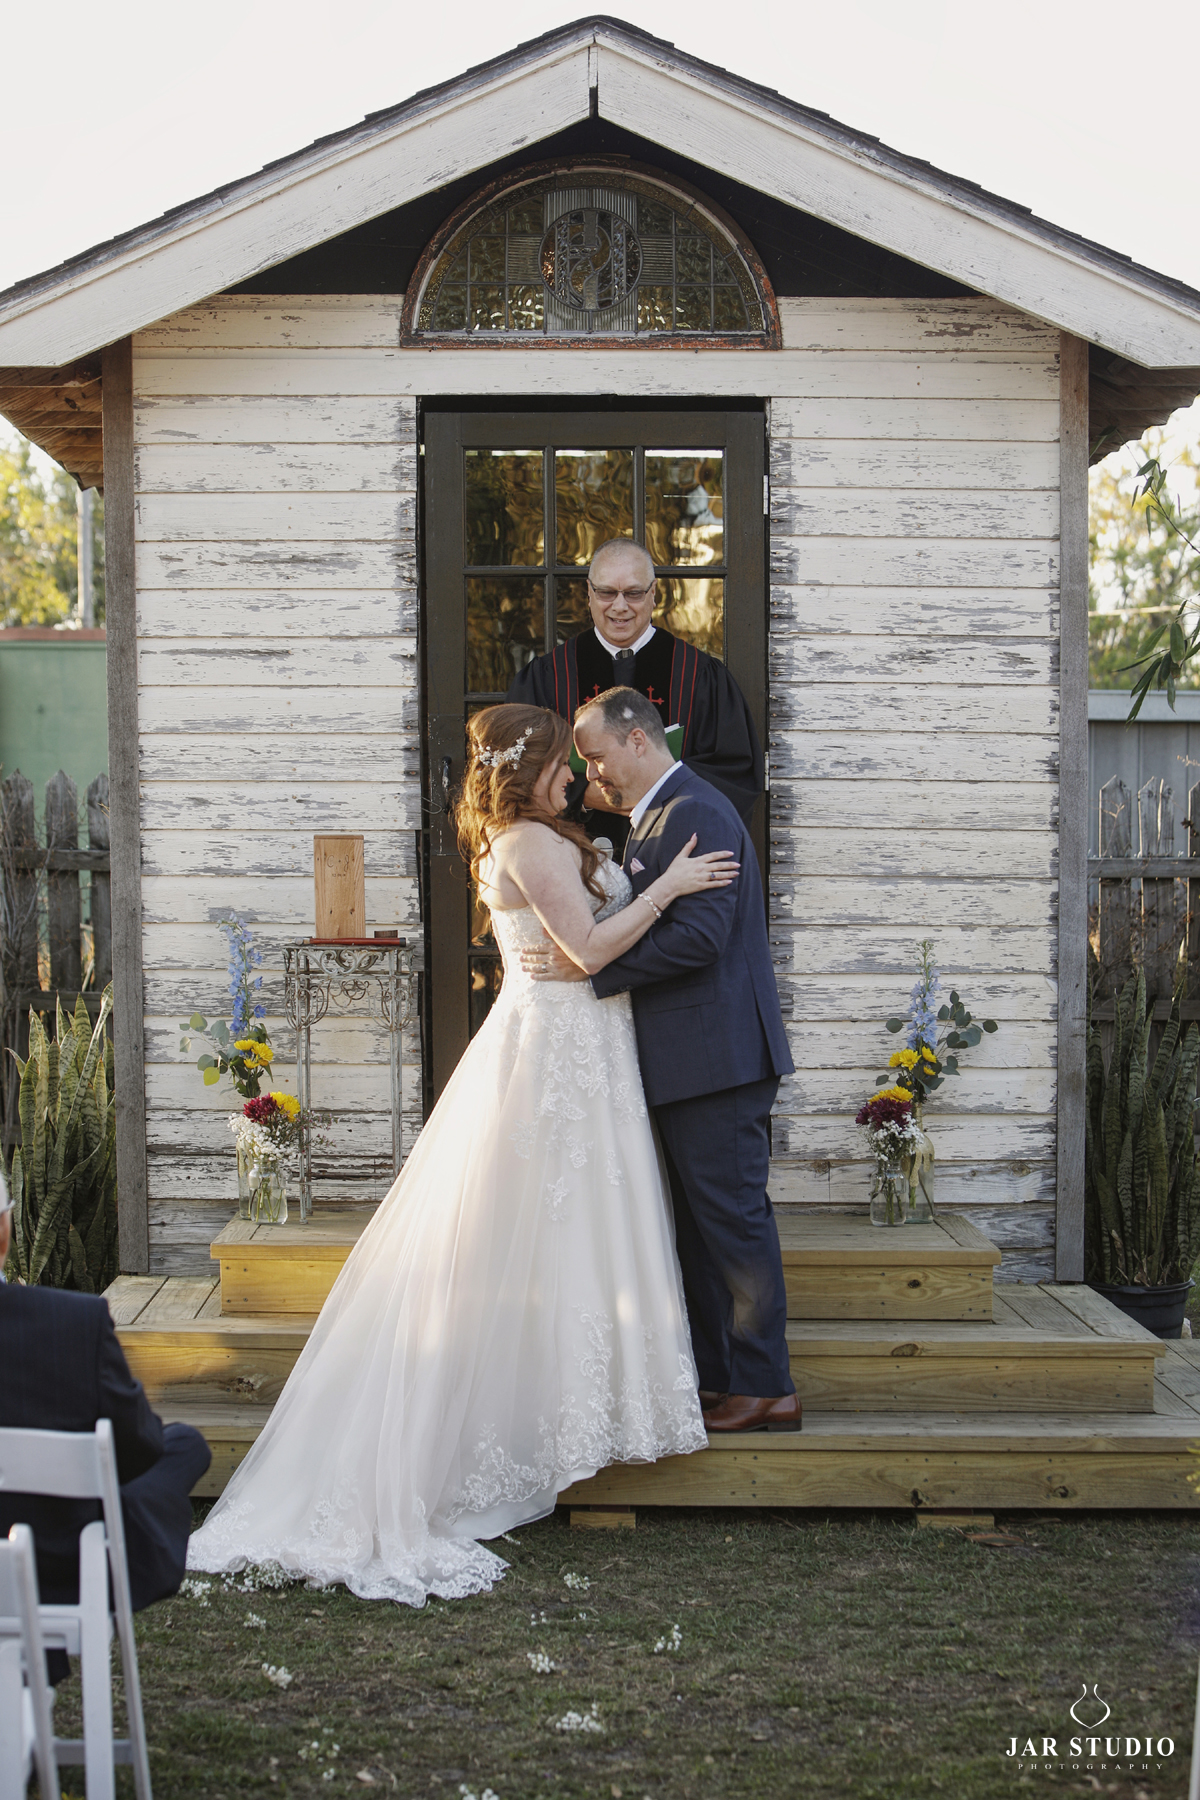 25-unique-place-for-outdoor-wedding-orlando-photographer-jarstudio.JPG